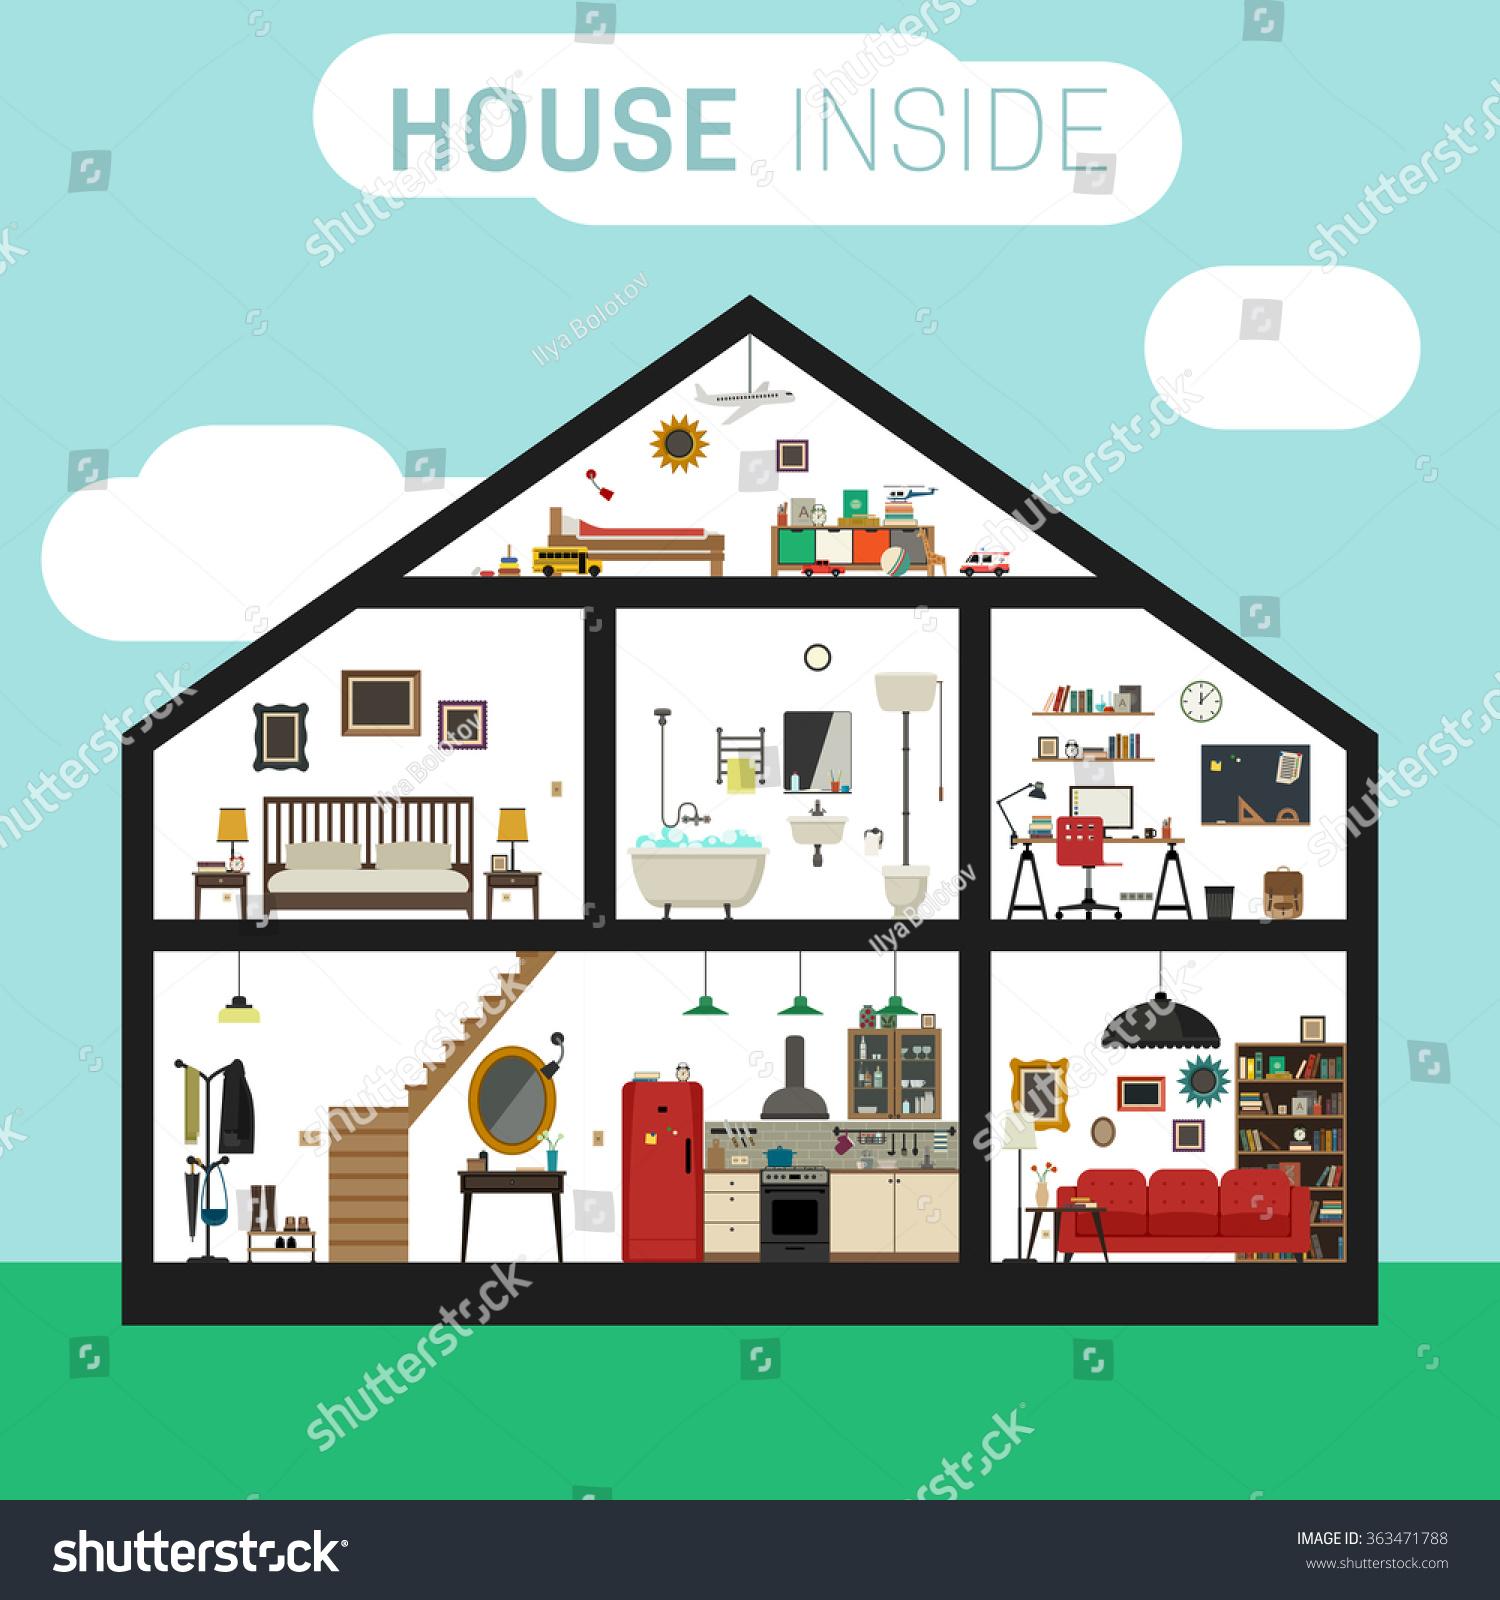 House inside interior